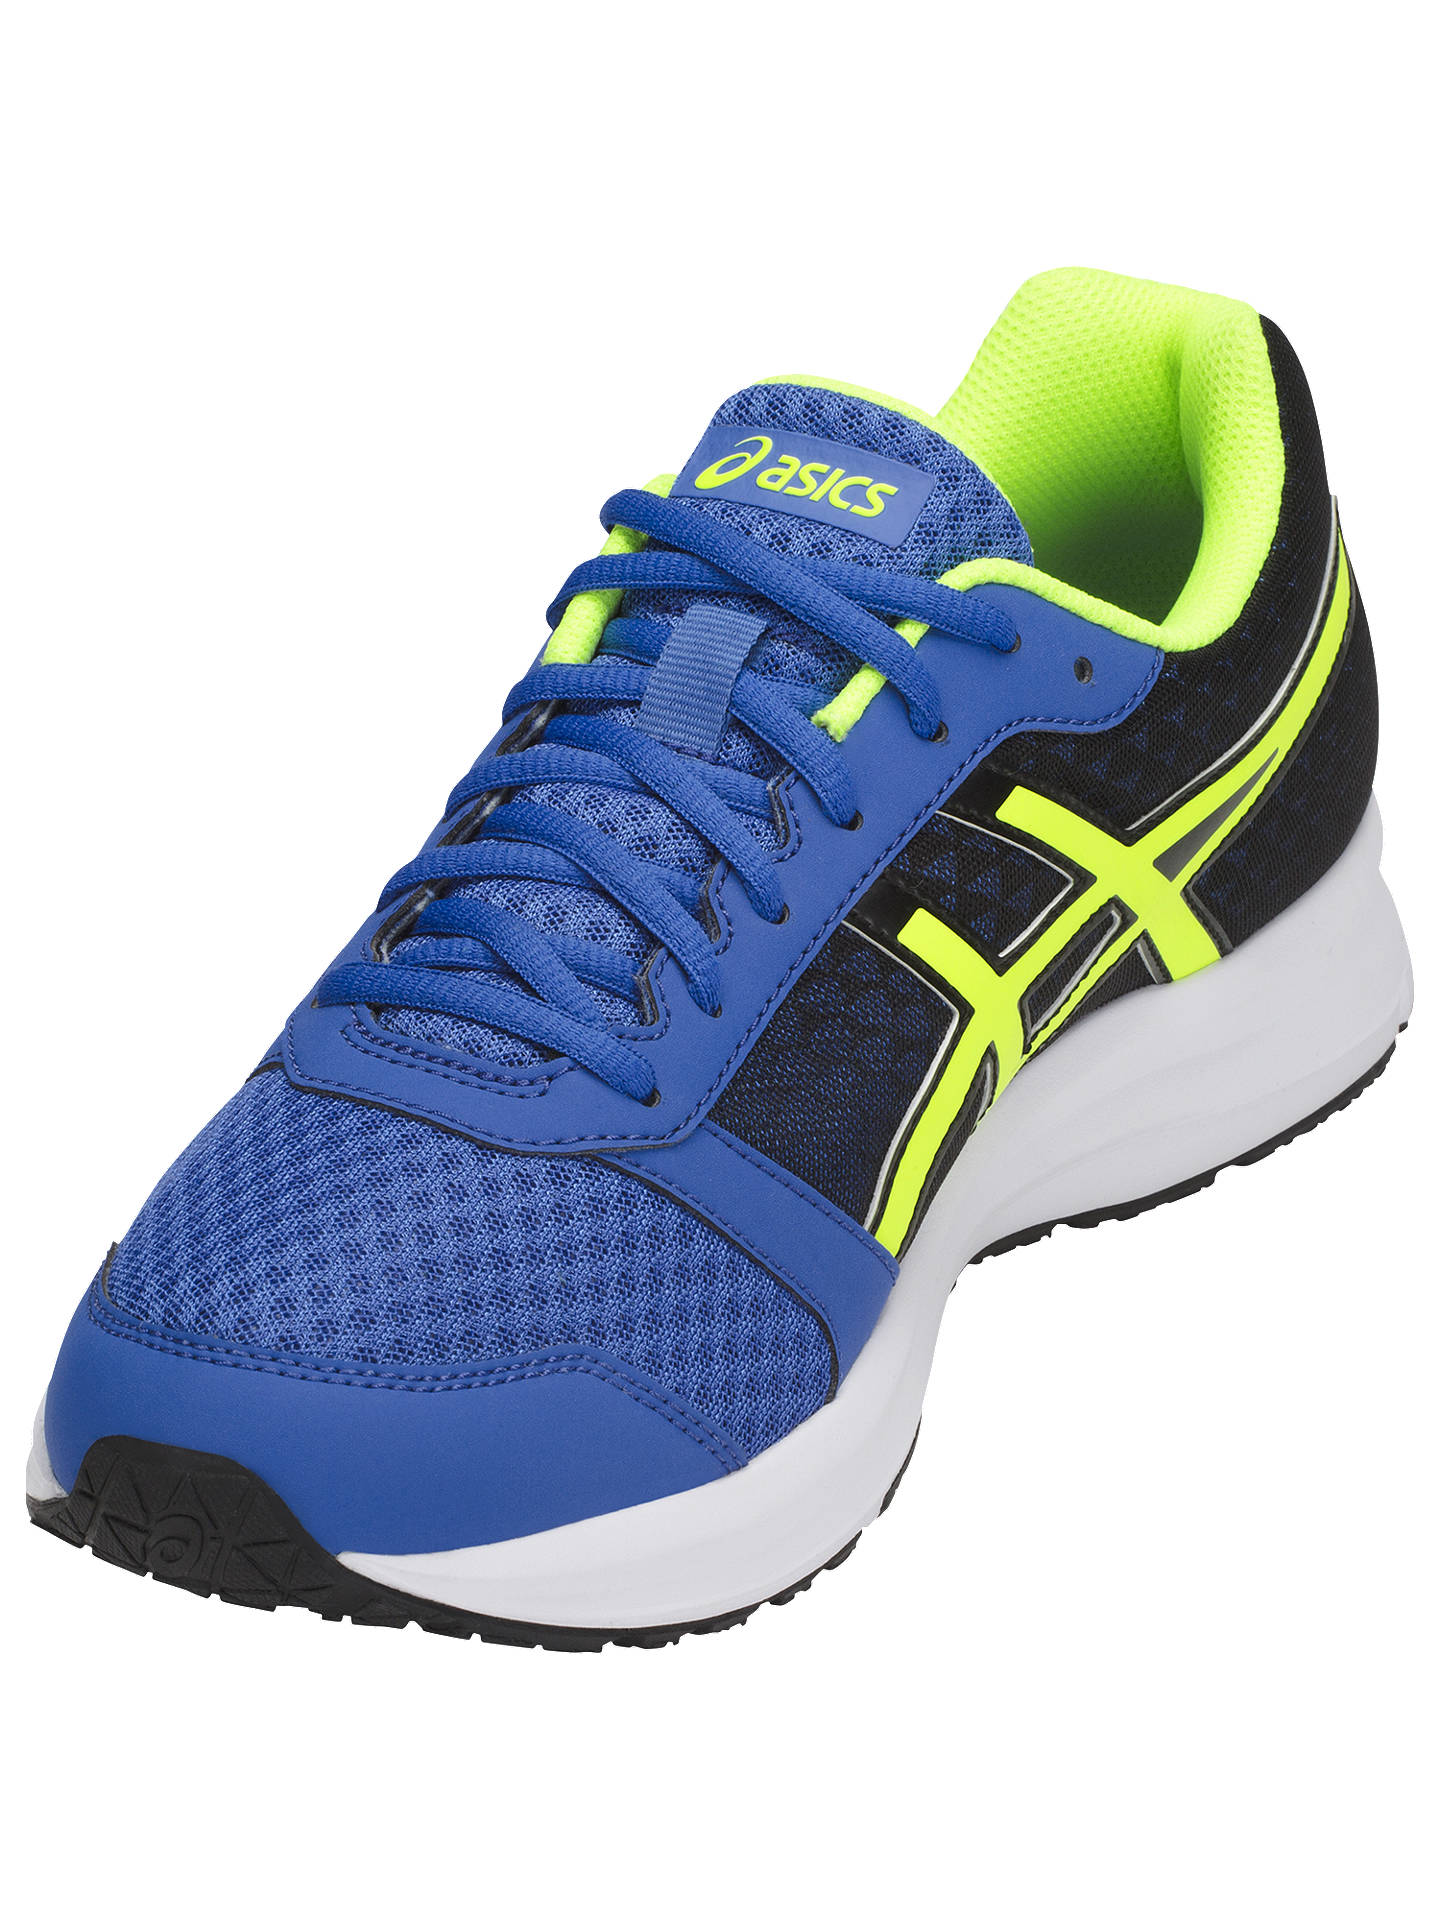 ASICS Patriot 9 Men's Running Shoes at John Lewis & Partners